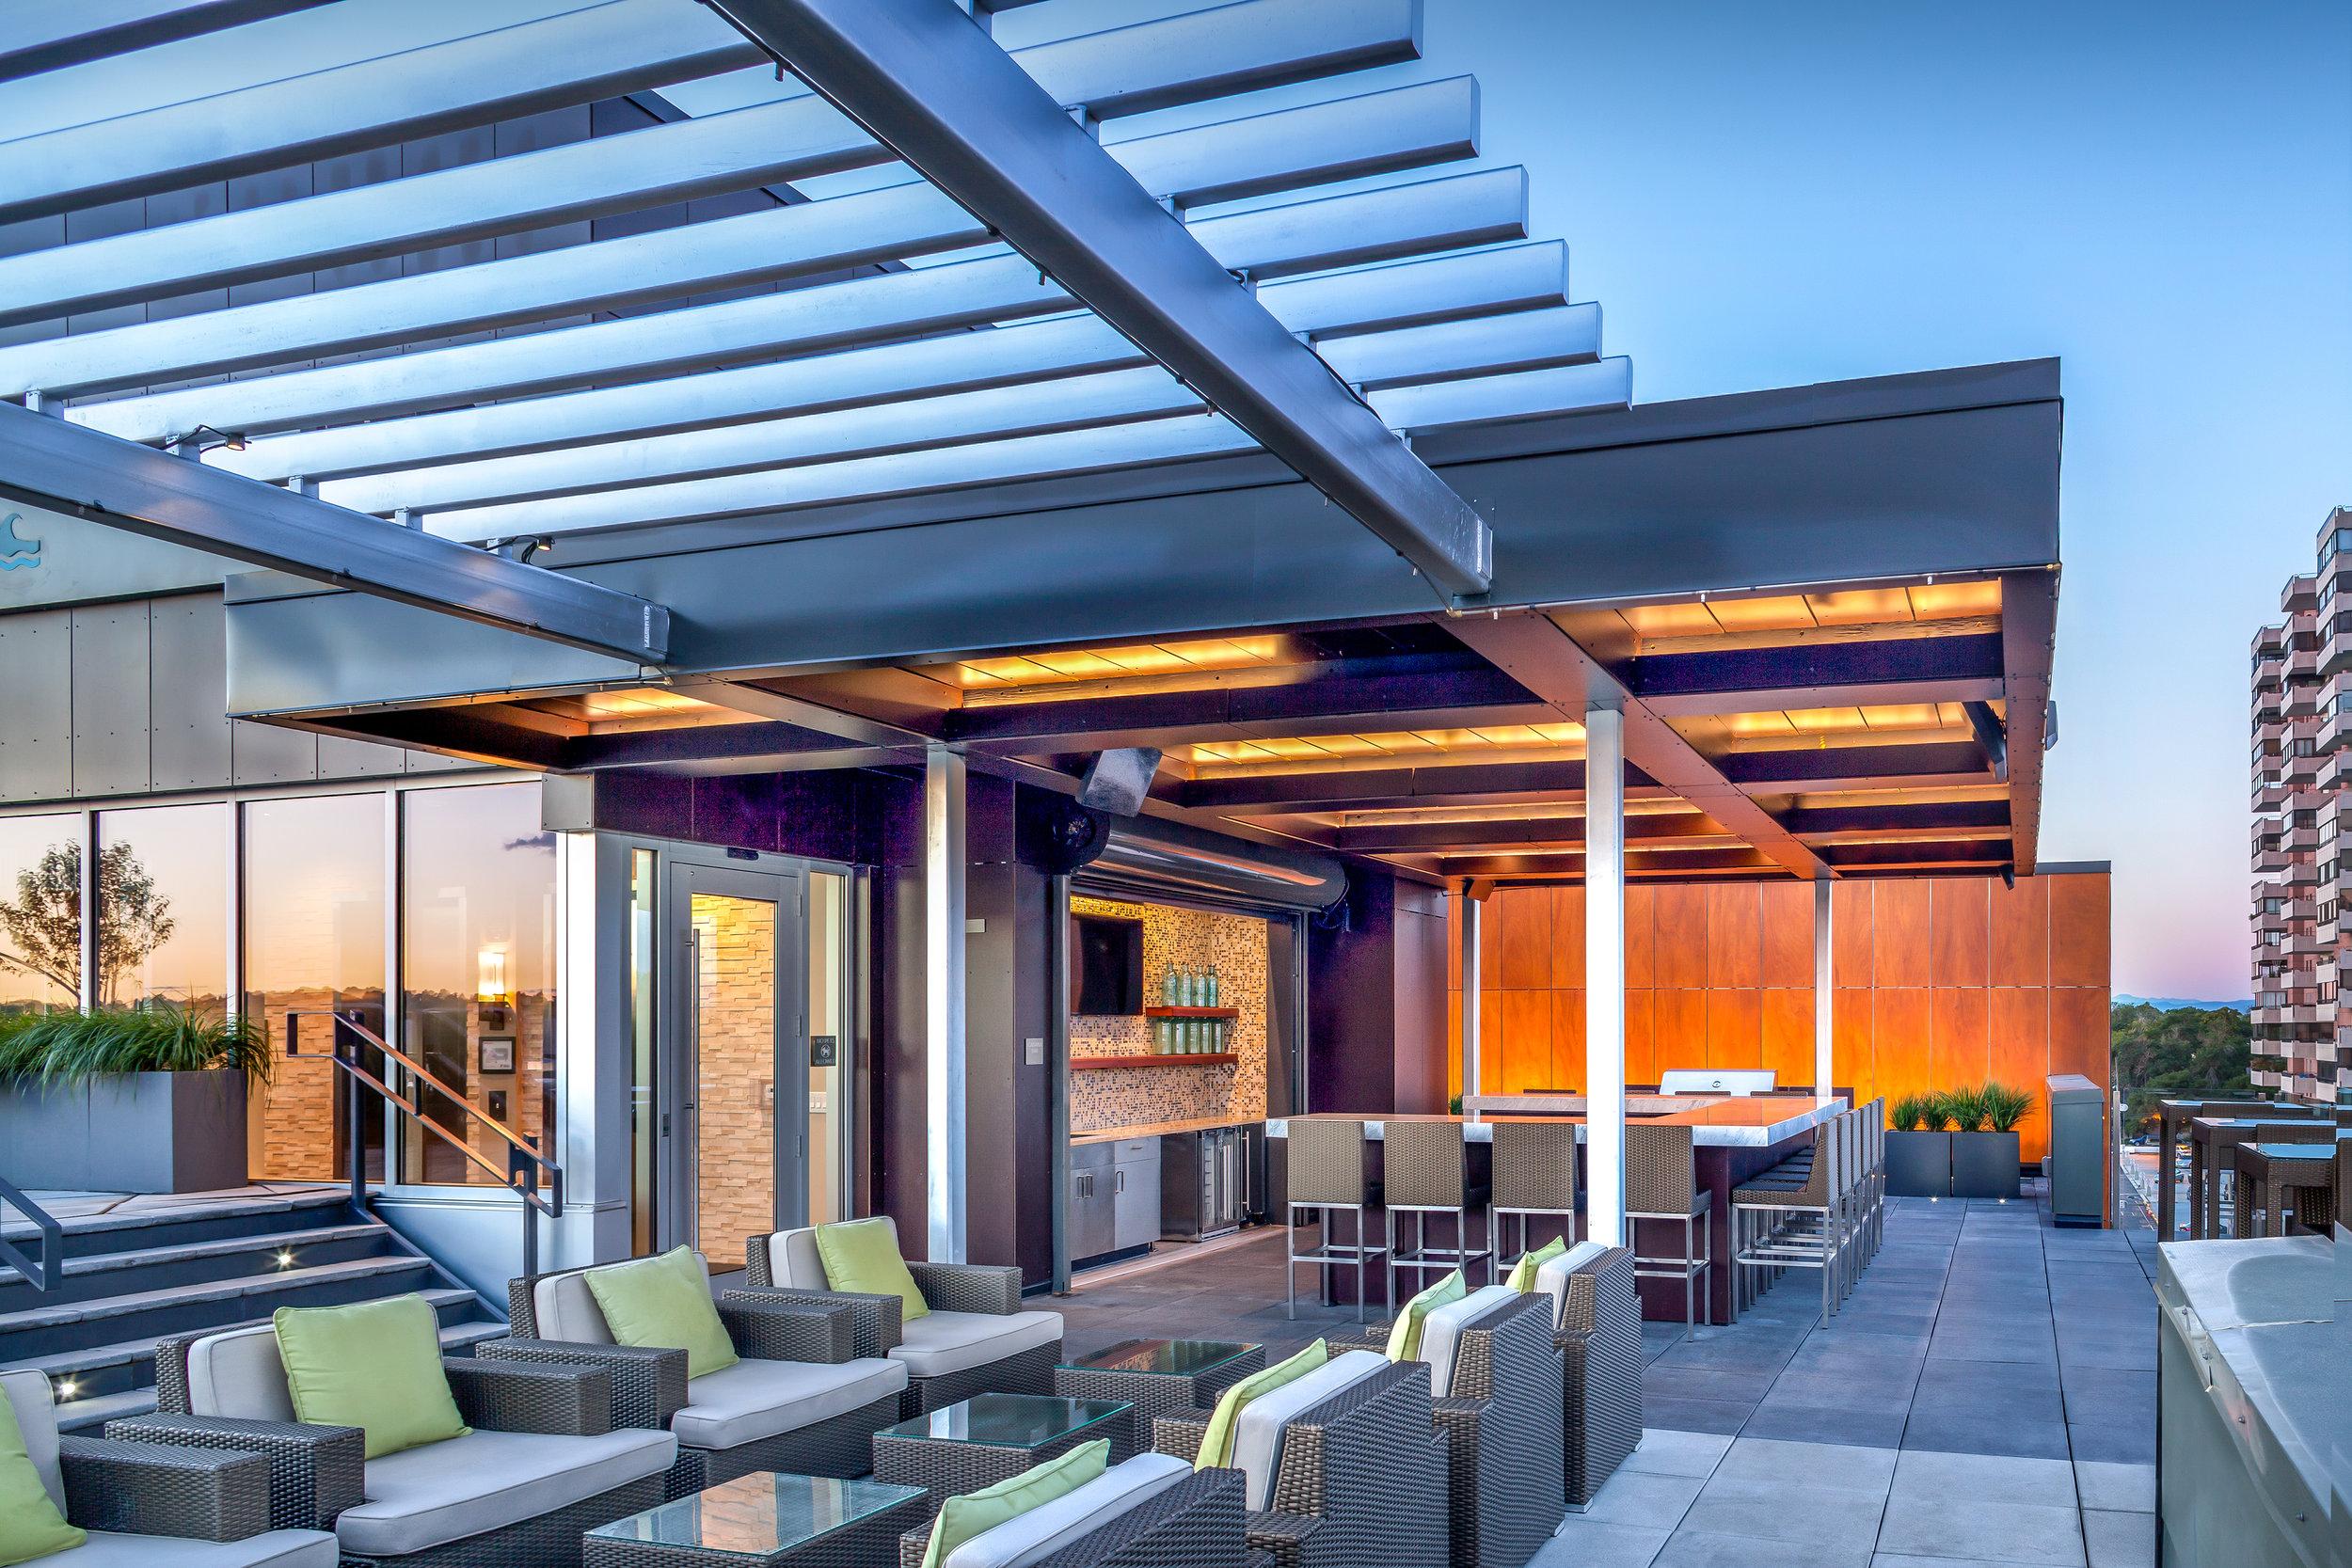 "<img src="" studioINSITE_My_Block_Wash_Park_Rooftop_Lounge ""alt=""Urban Living, Multifamily Courtyards, Amenity Deck, Swimming Pool, Spa, Landscape Architecture, Luxury Living, My Block Wash Park, Denver, CO, Colorado Courtyards, Rooftop Amenity  "" title=""My Block Wash Park  ""/>"